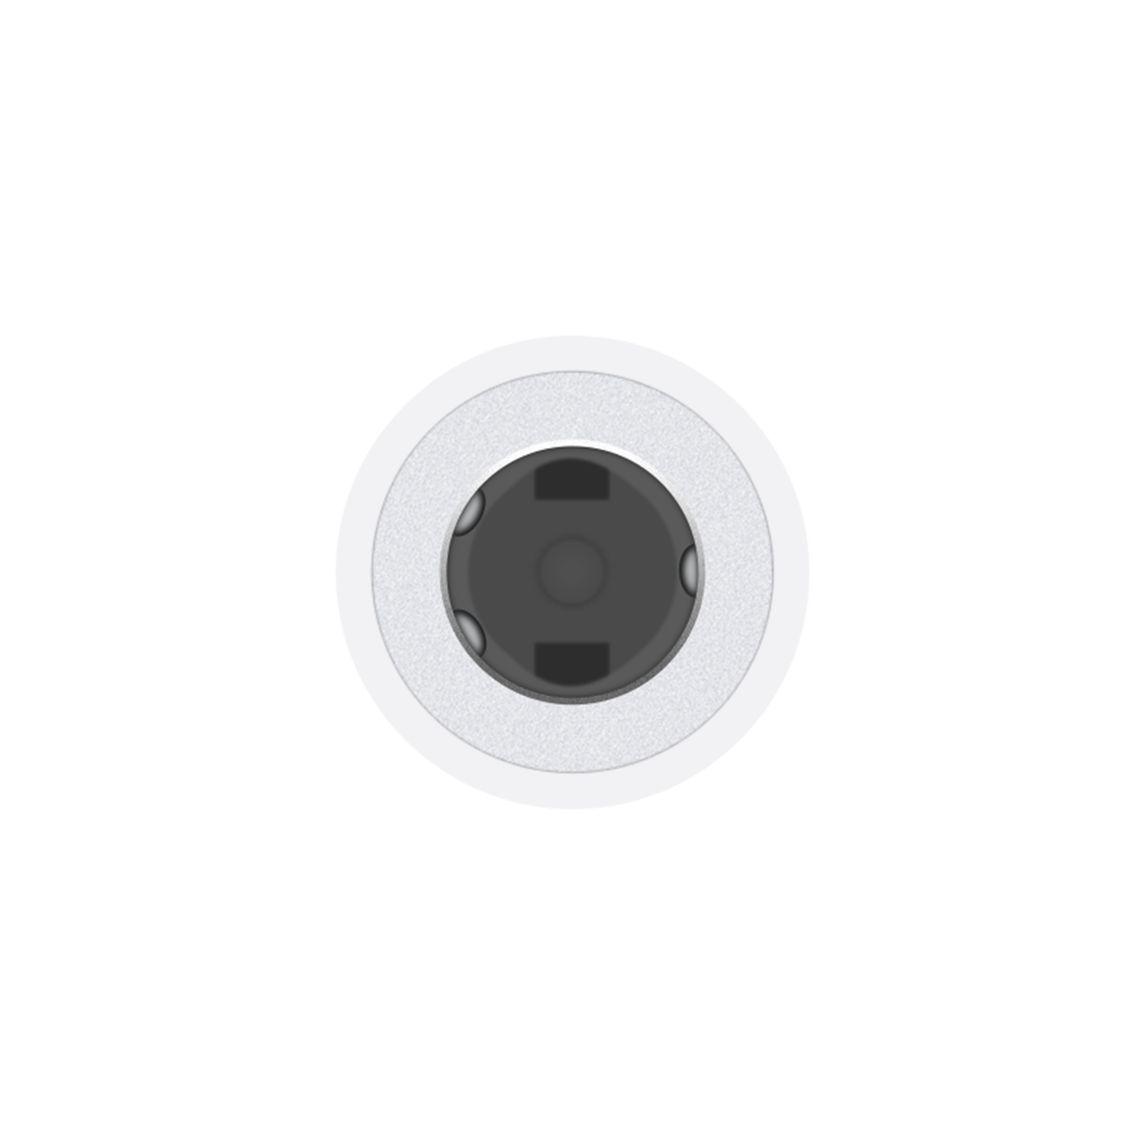 USB-C to 3 5 mm Headphone Jack Adapter